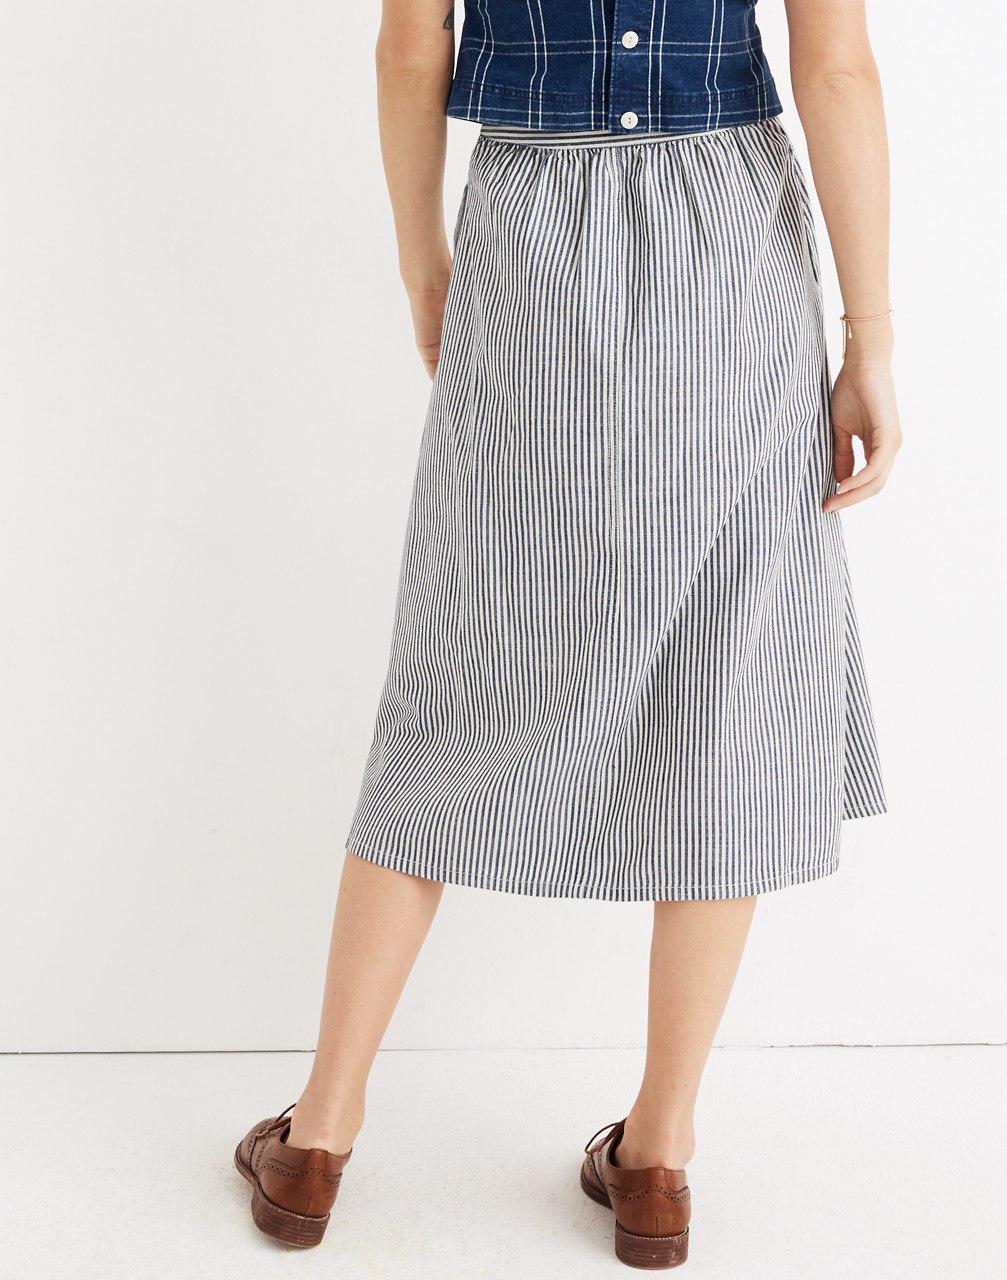 7755dc8437 Palisade Button Front Midi Skirt In Chambray Stripe | Saddha